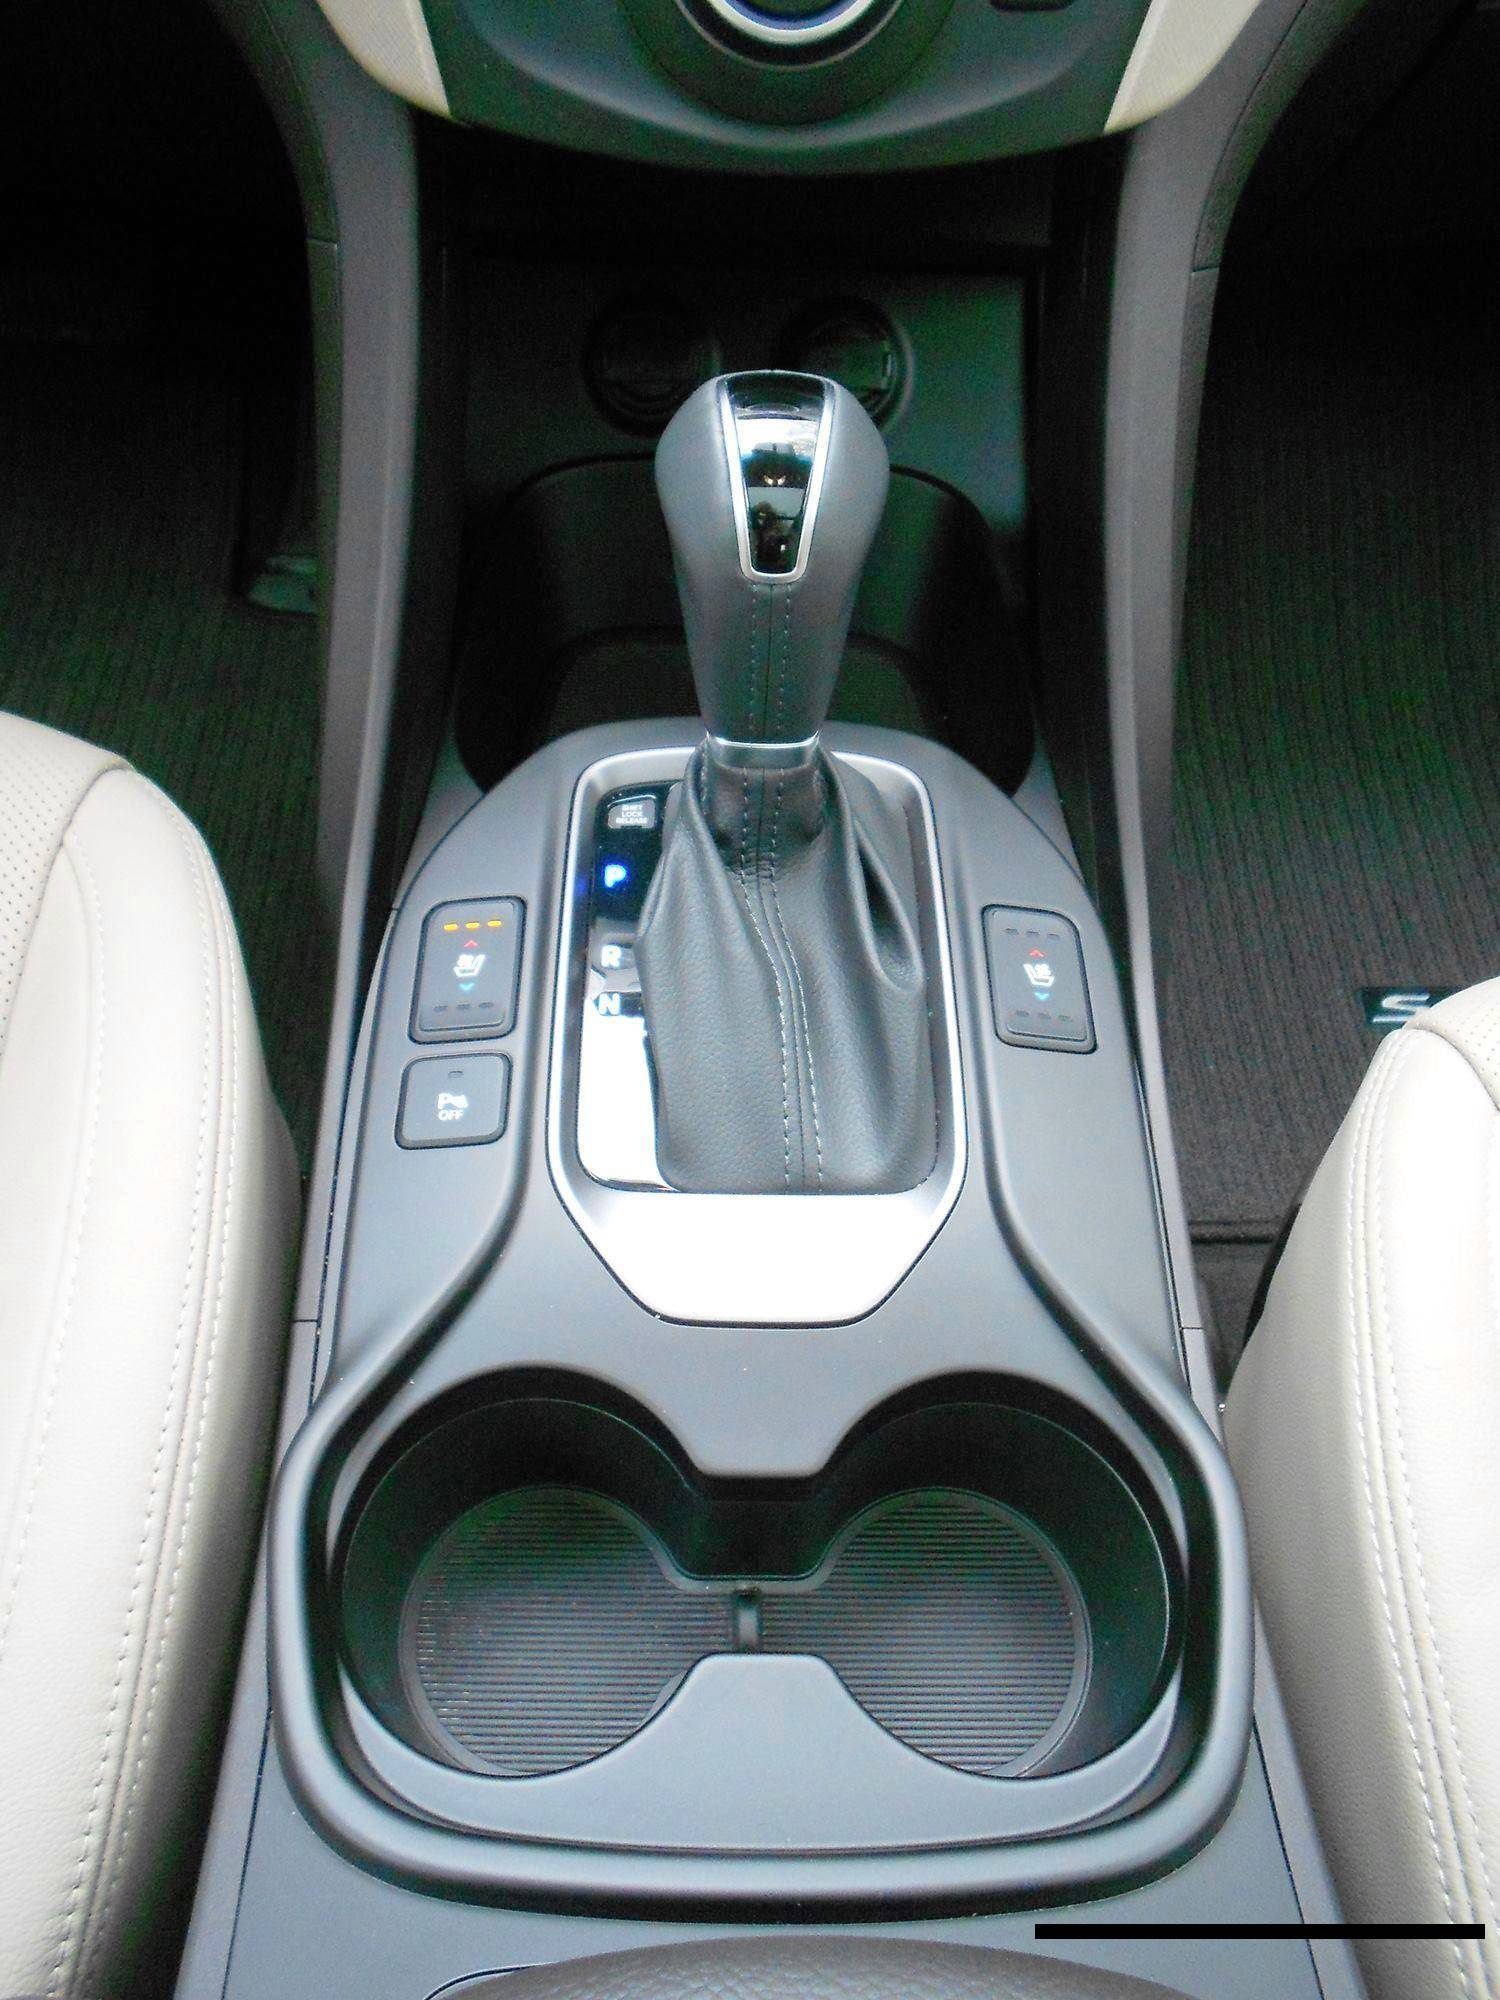 2017 Hyundai Santa Fe Ultimate Road Test Review By Tim Esterdahl 187 Car Revs Daily Com